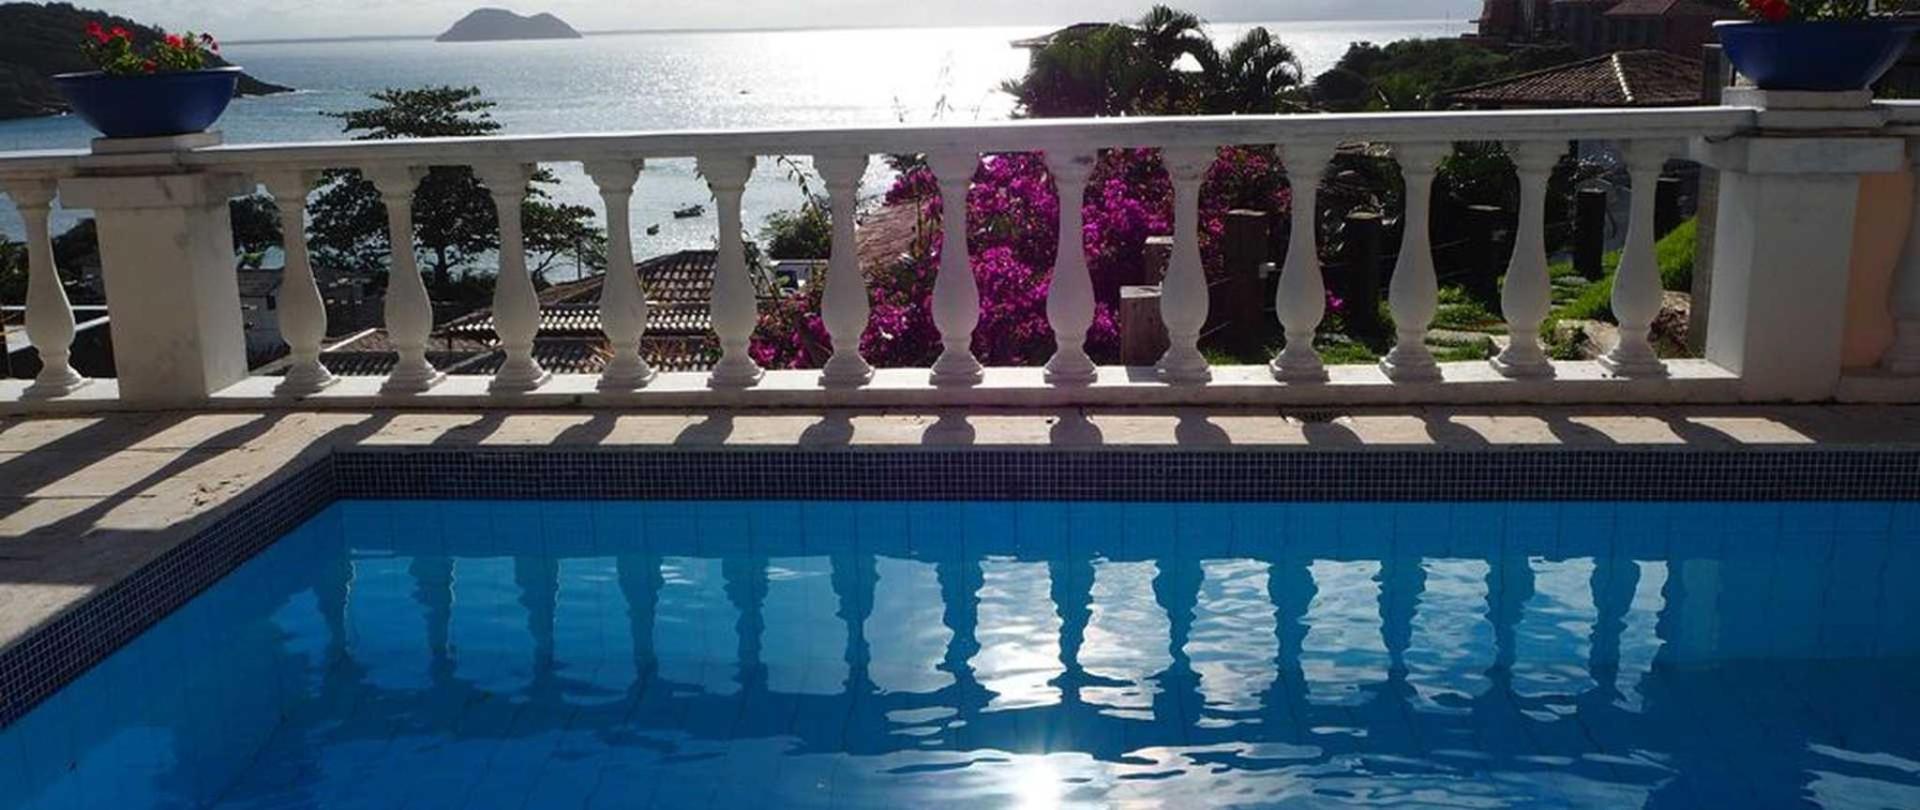 piscina.jpg.1920x810_default.jpeg